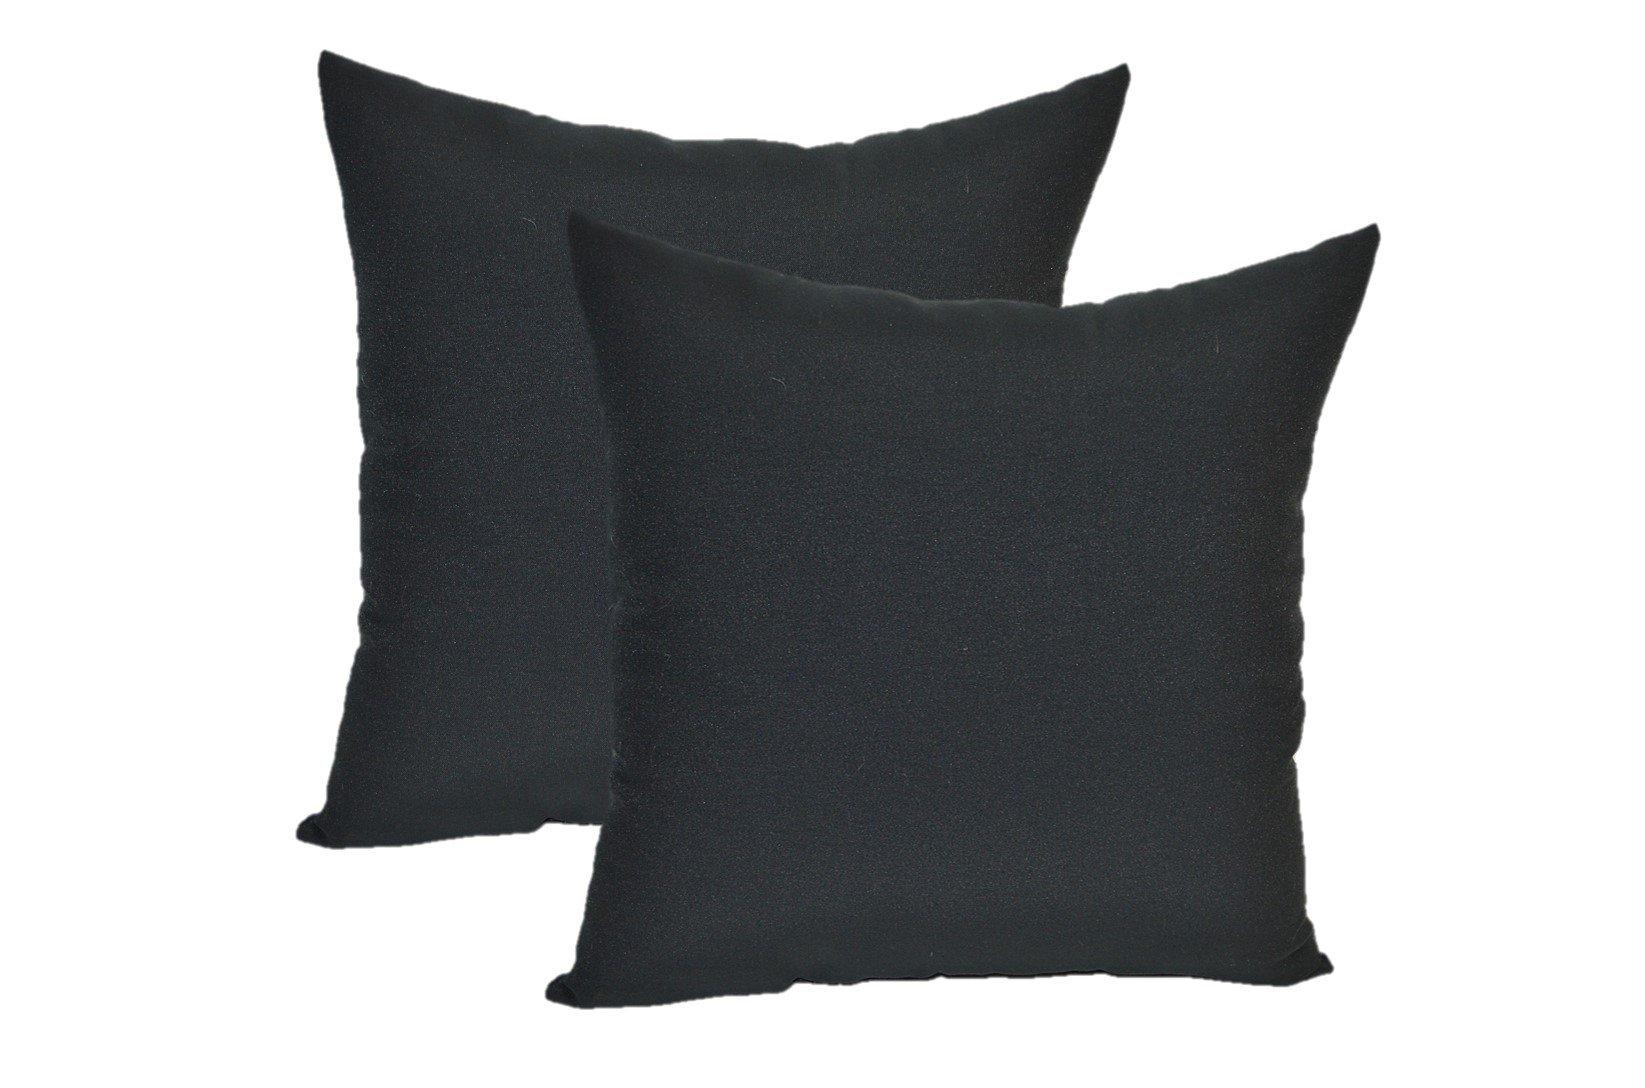 Set of 2 Indoor / Outdoor 20'' Decorative Throw Pillows - Solid Black